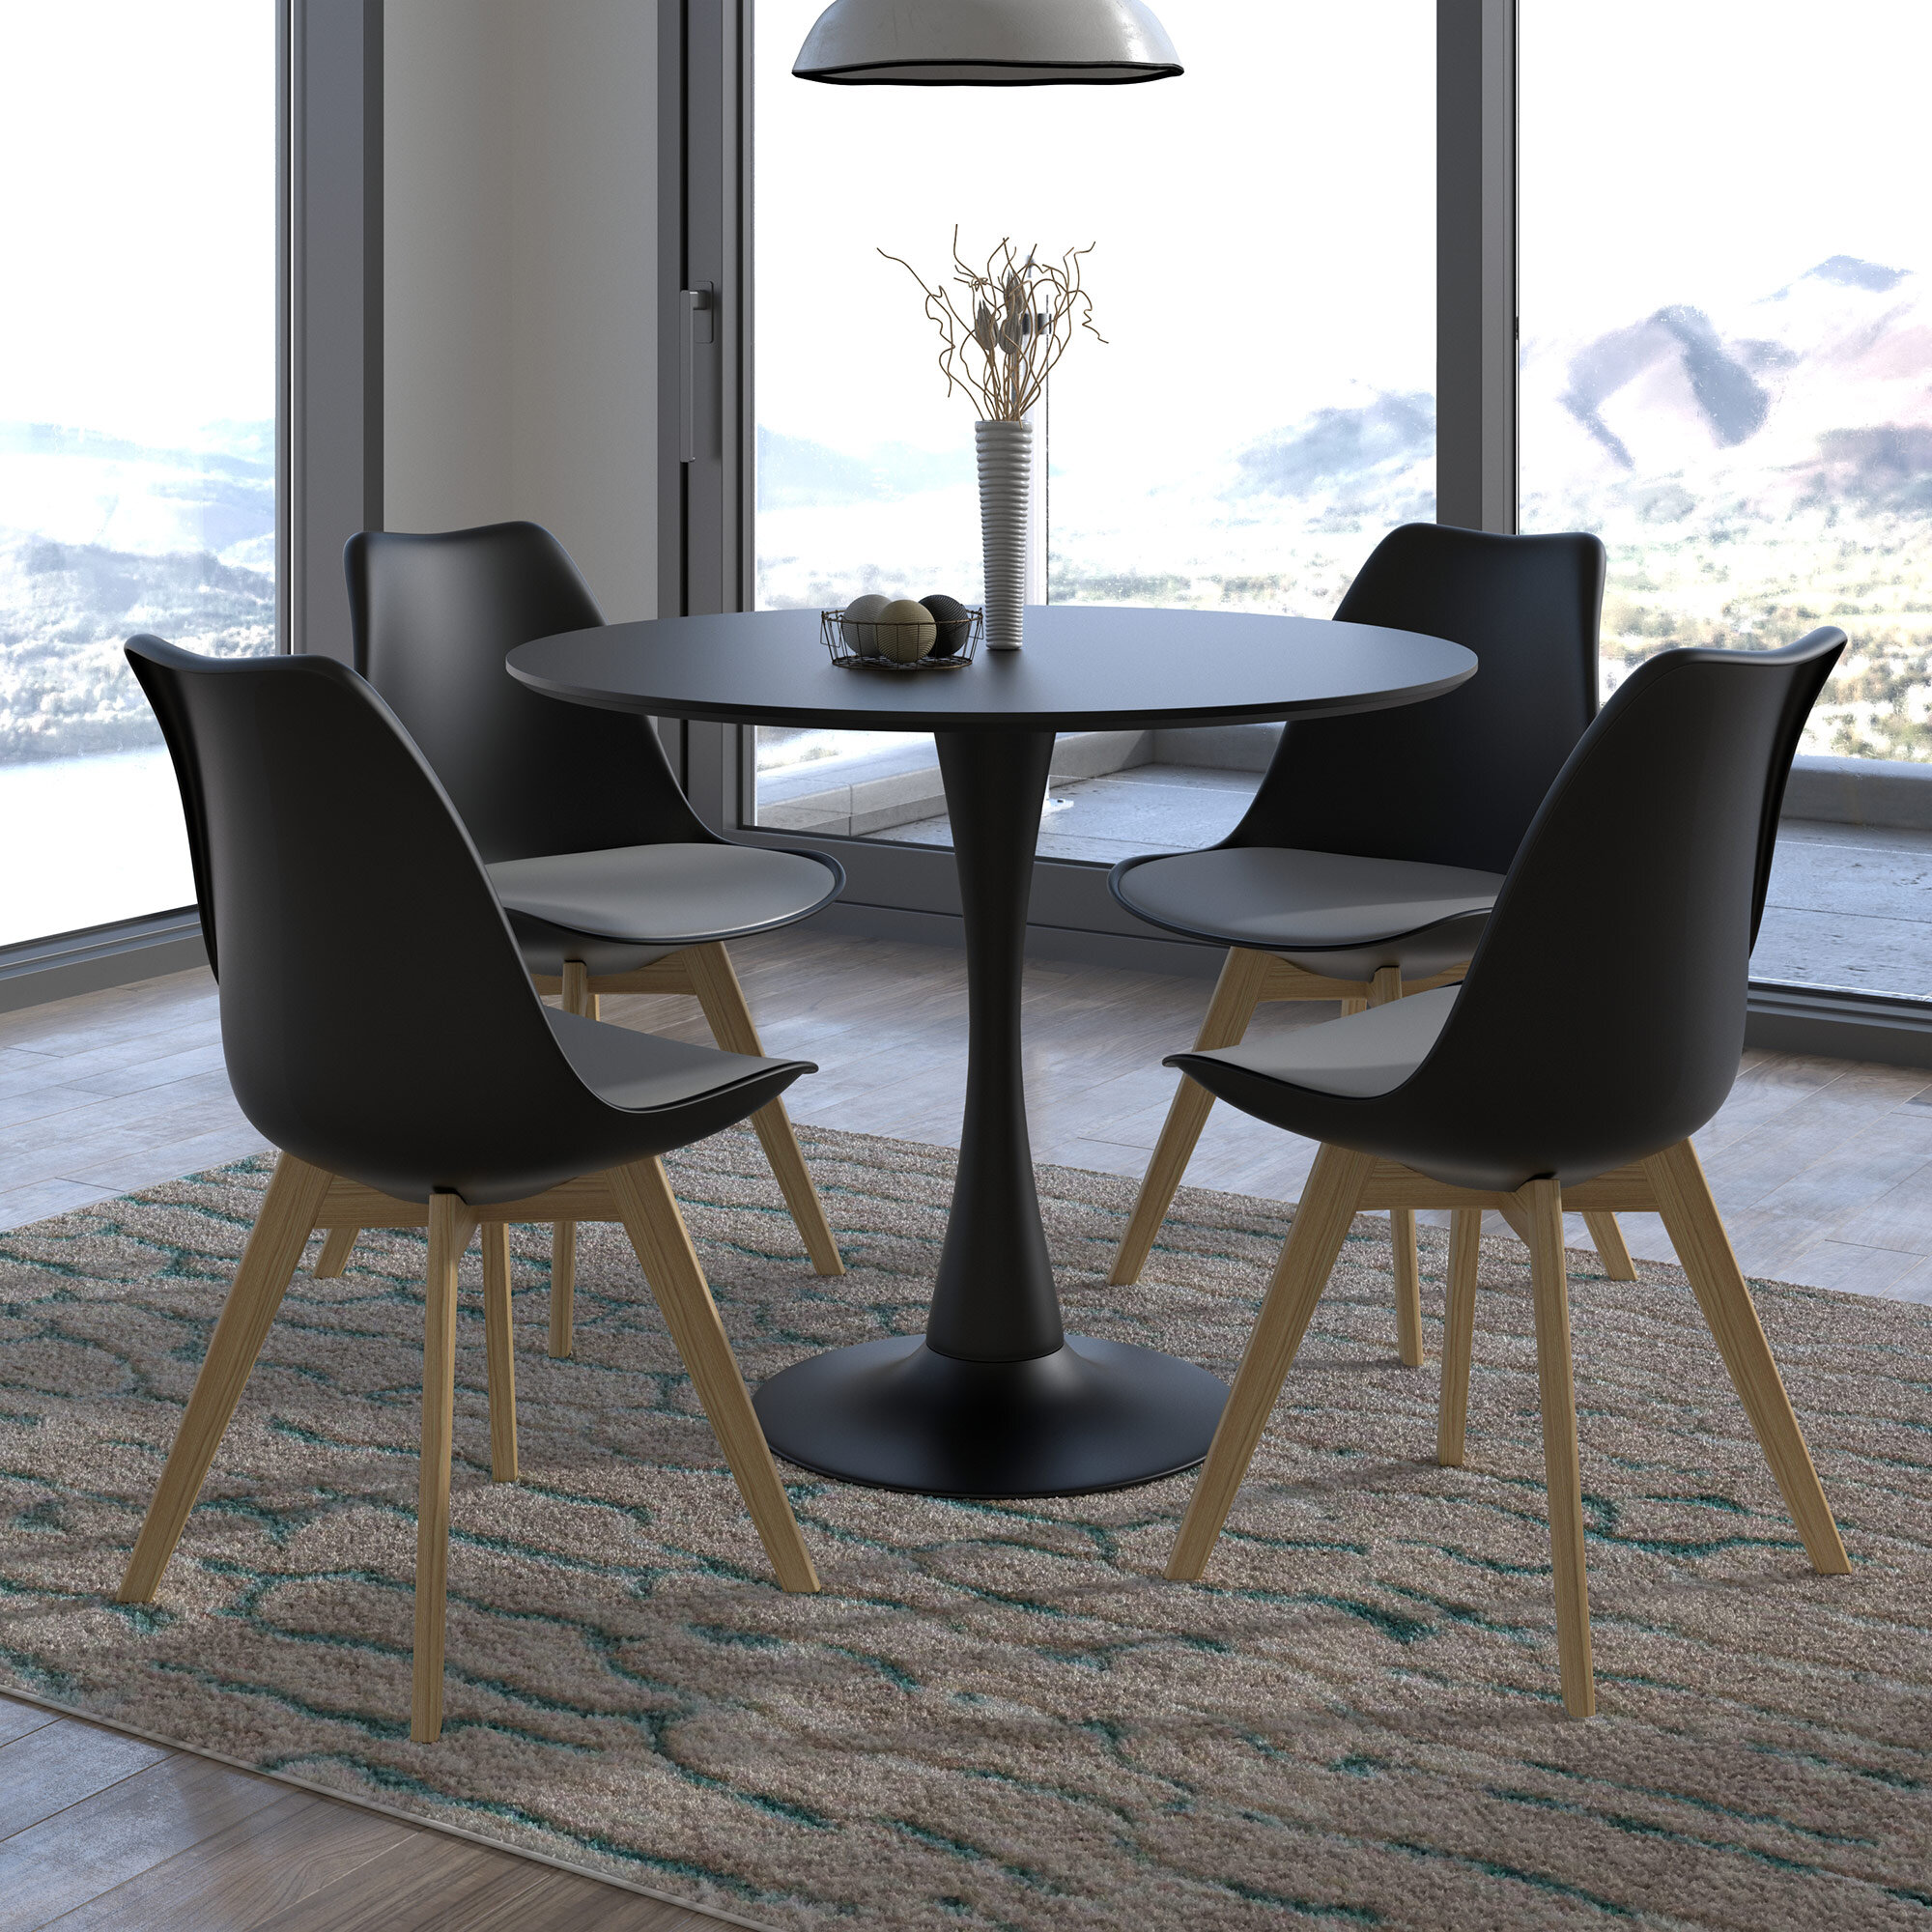 Modern Round Seats 4 Dining Room Sets Allmodern